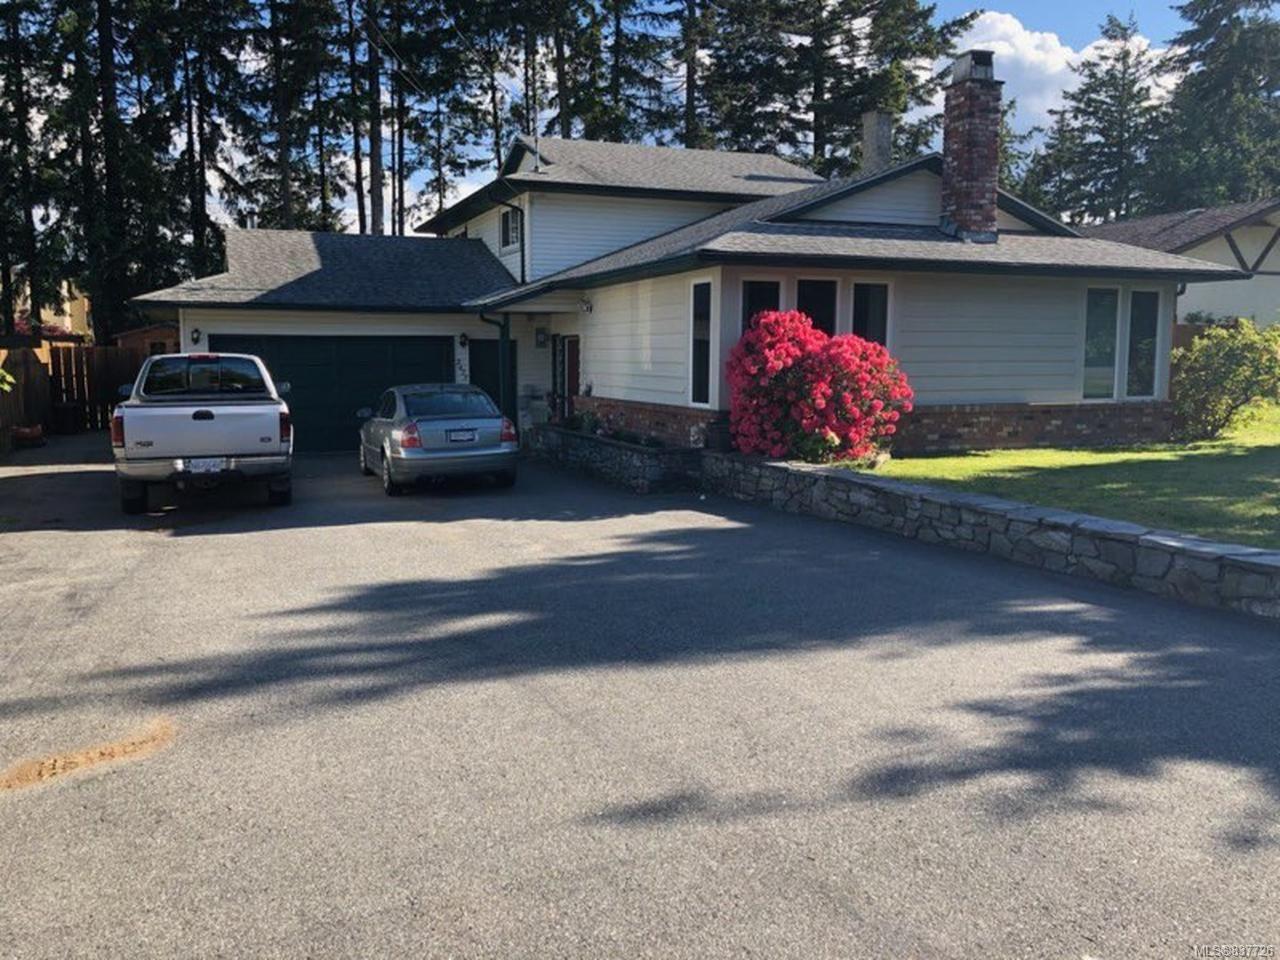 Main Photo: 2477 Divot Dr in NANAIMO: Na Departure Bay House for sale (Nanaimo)  : MLS®# 837726